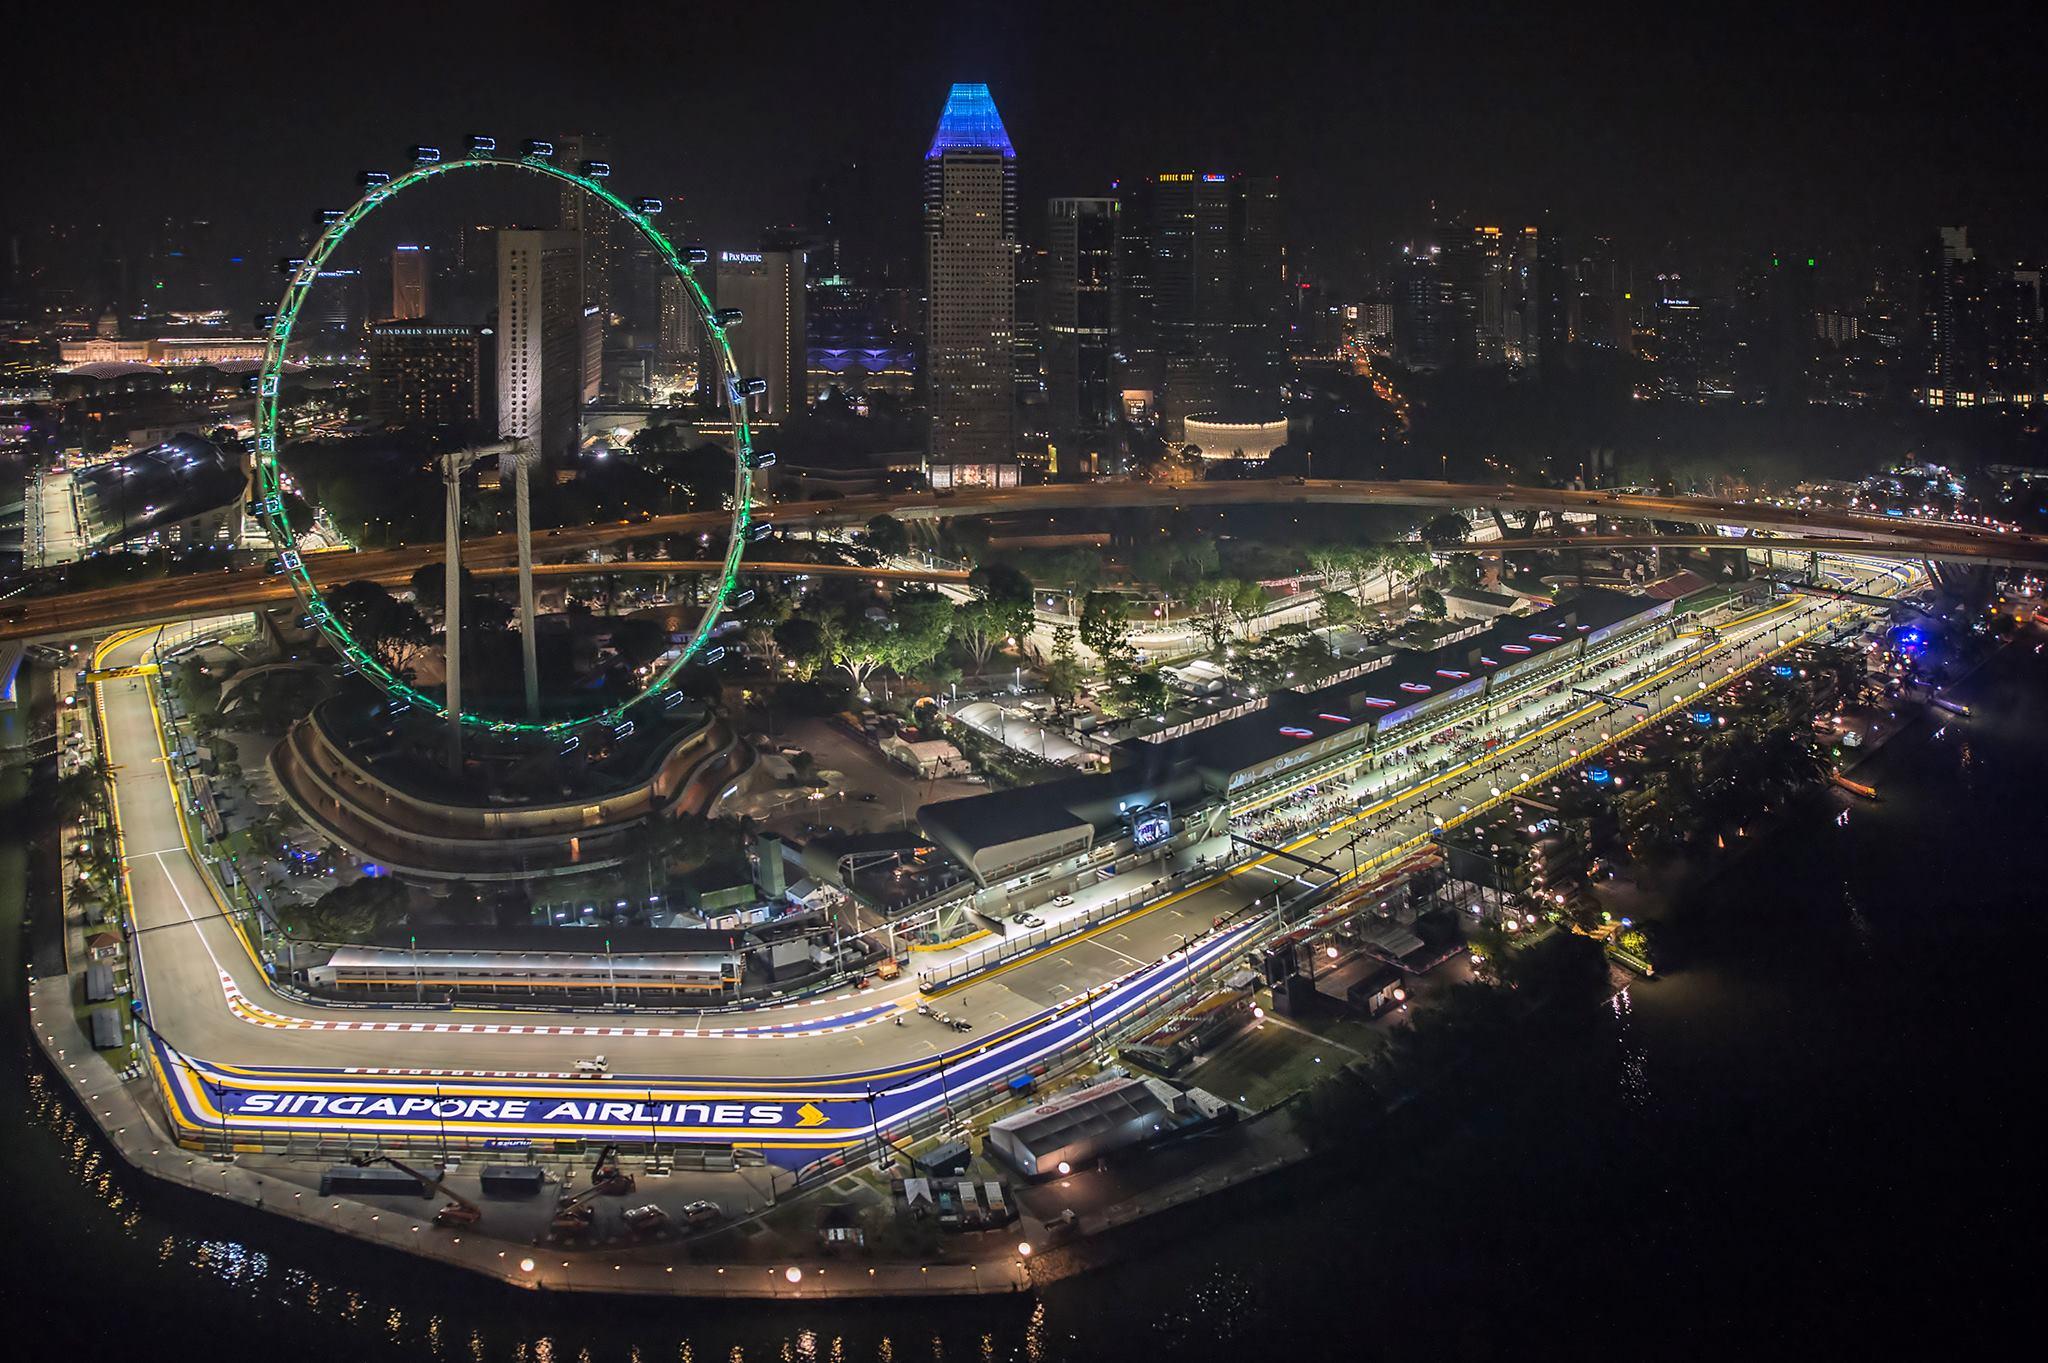 F1 Singapore 2018 - Singapore Grand Prix